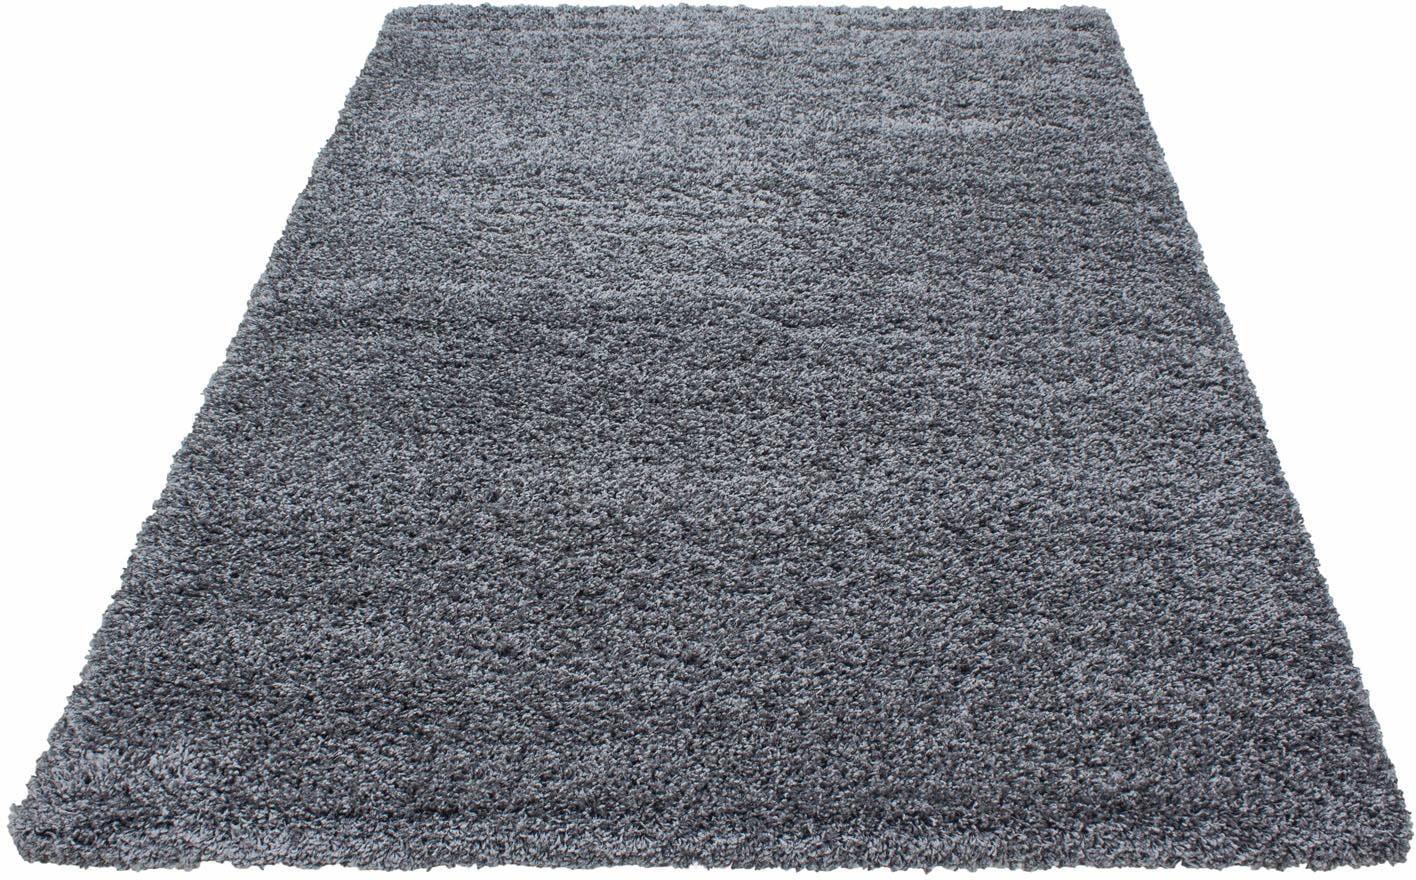 Hochflor-Teppich Dream Shaggy Ayyildiz rechteckig Höhe 50 mm maschinell gewebt